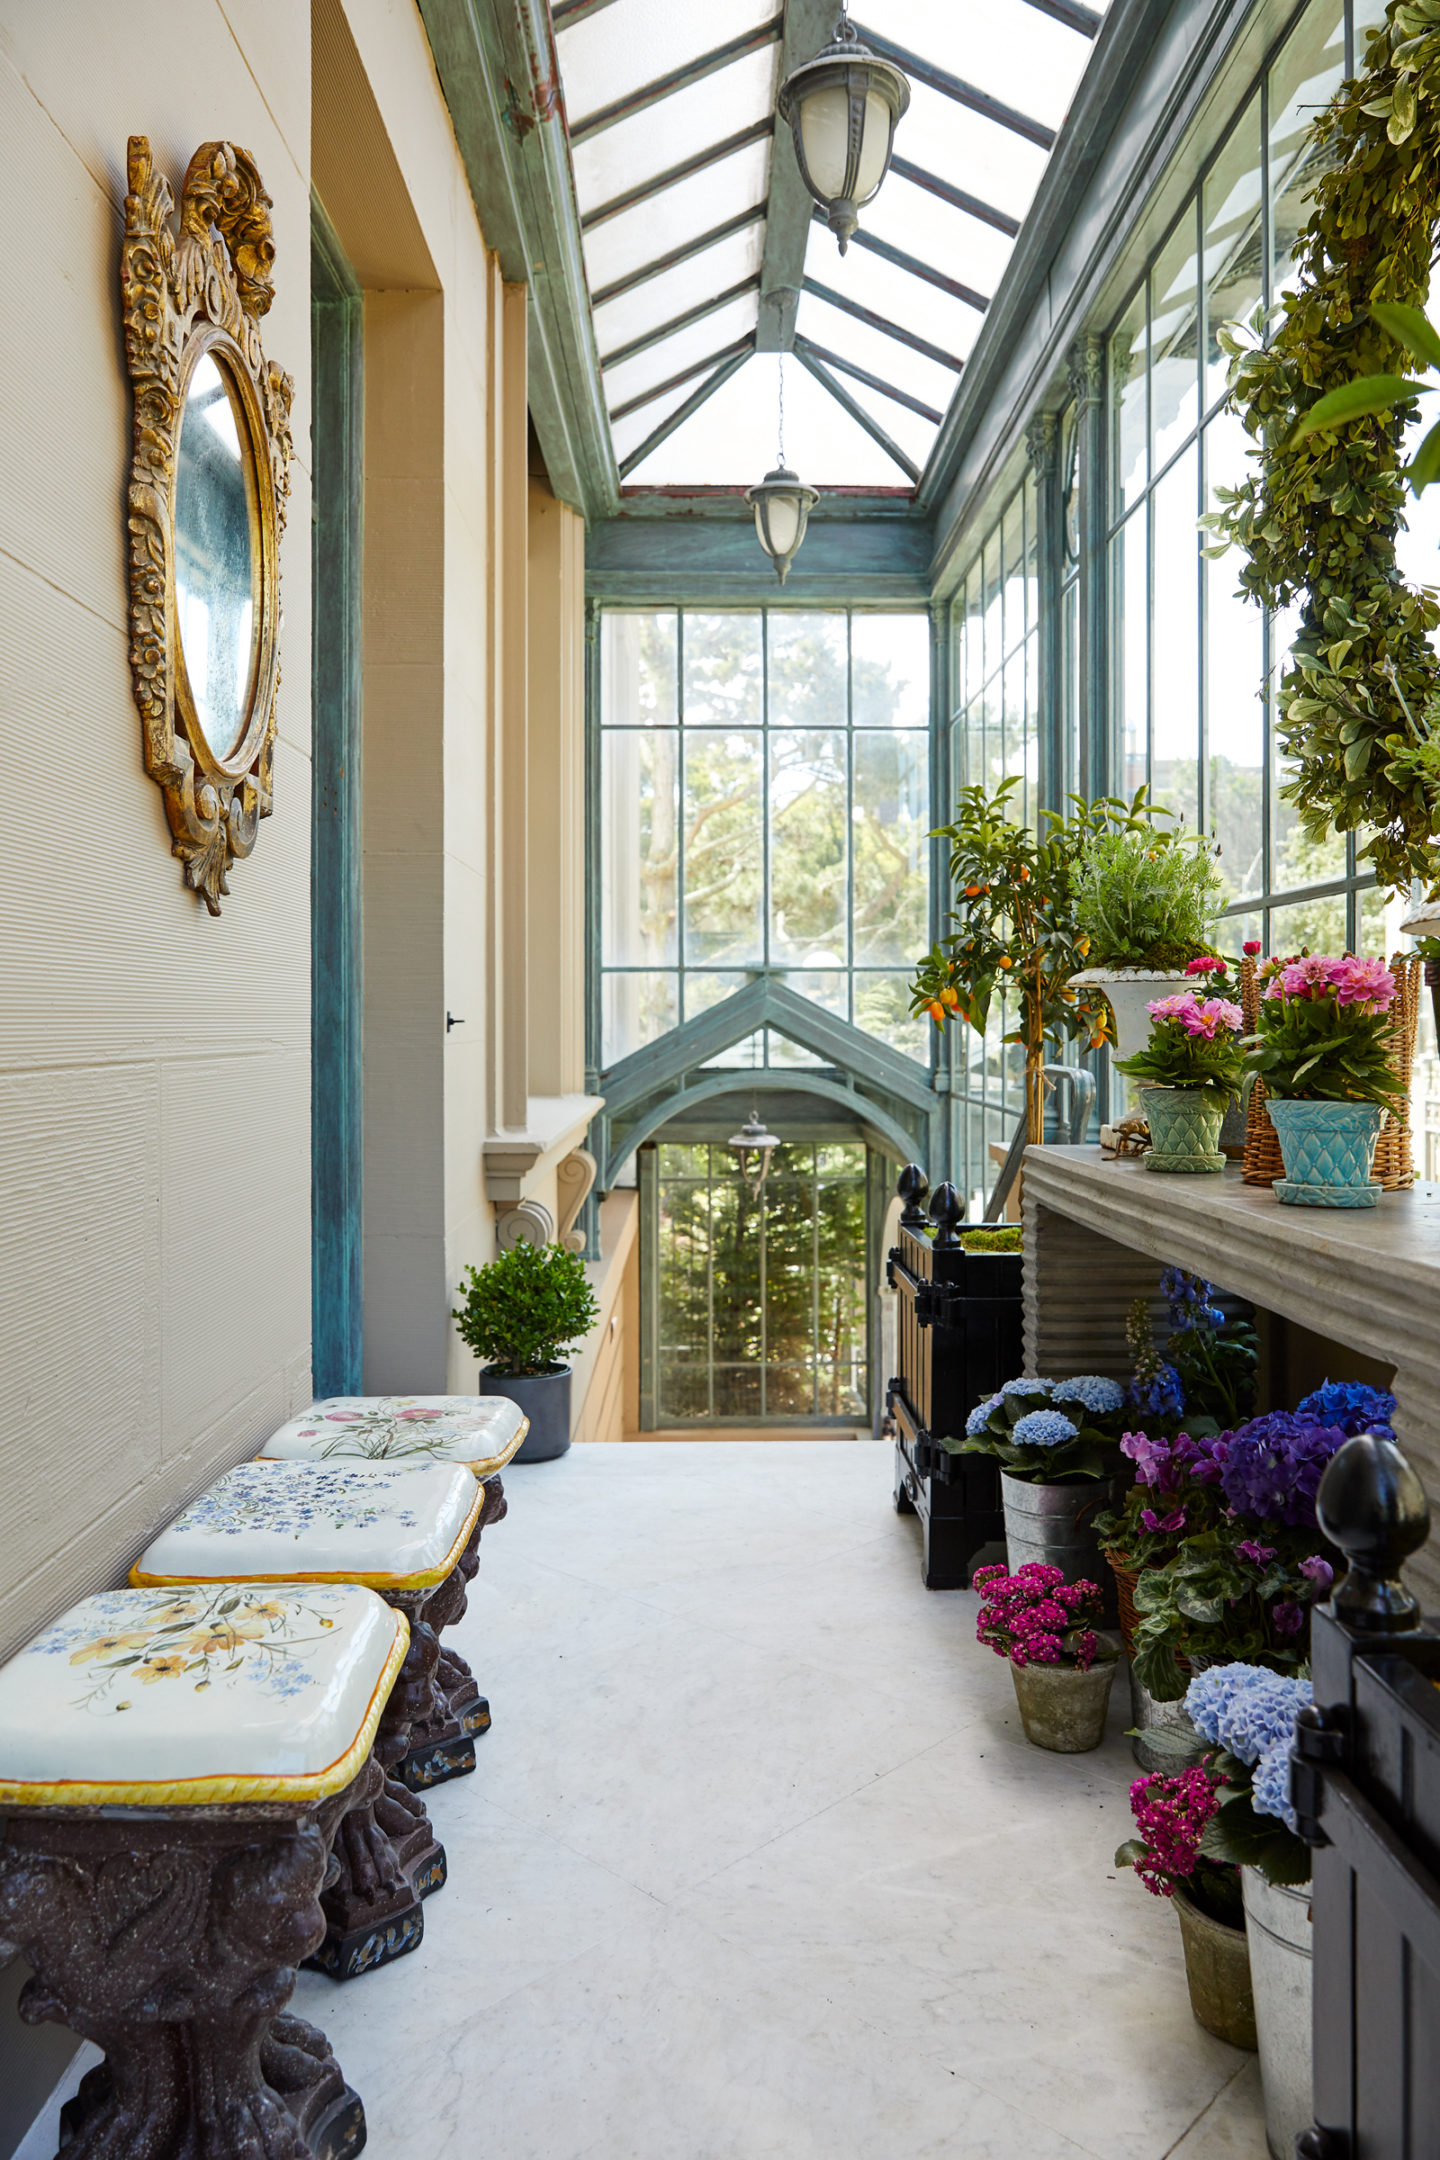 A Beautiful Flower Arranging Room And Orangerie Petite Haus